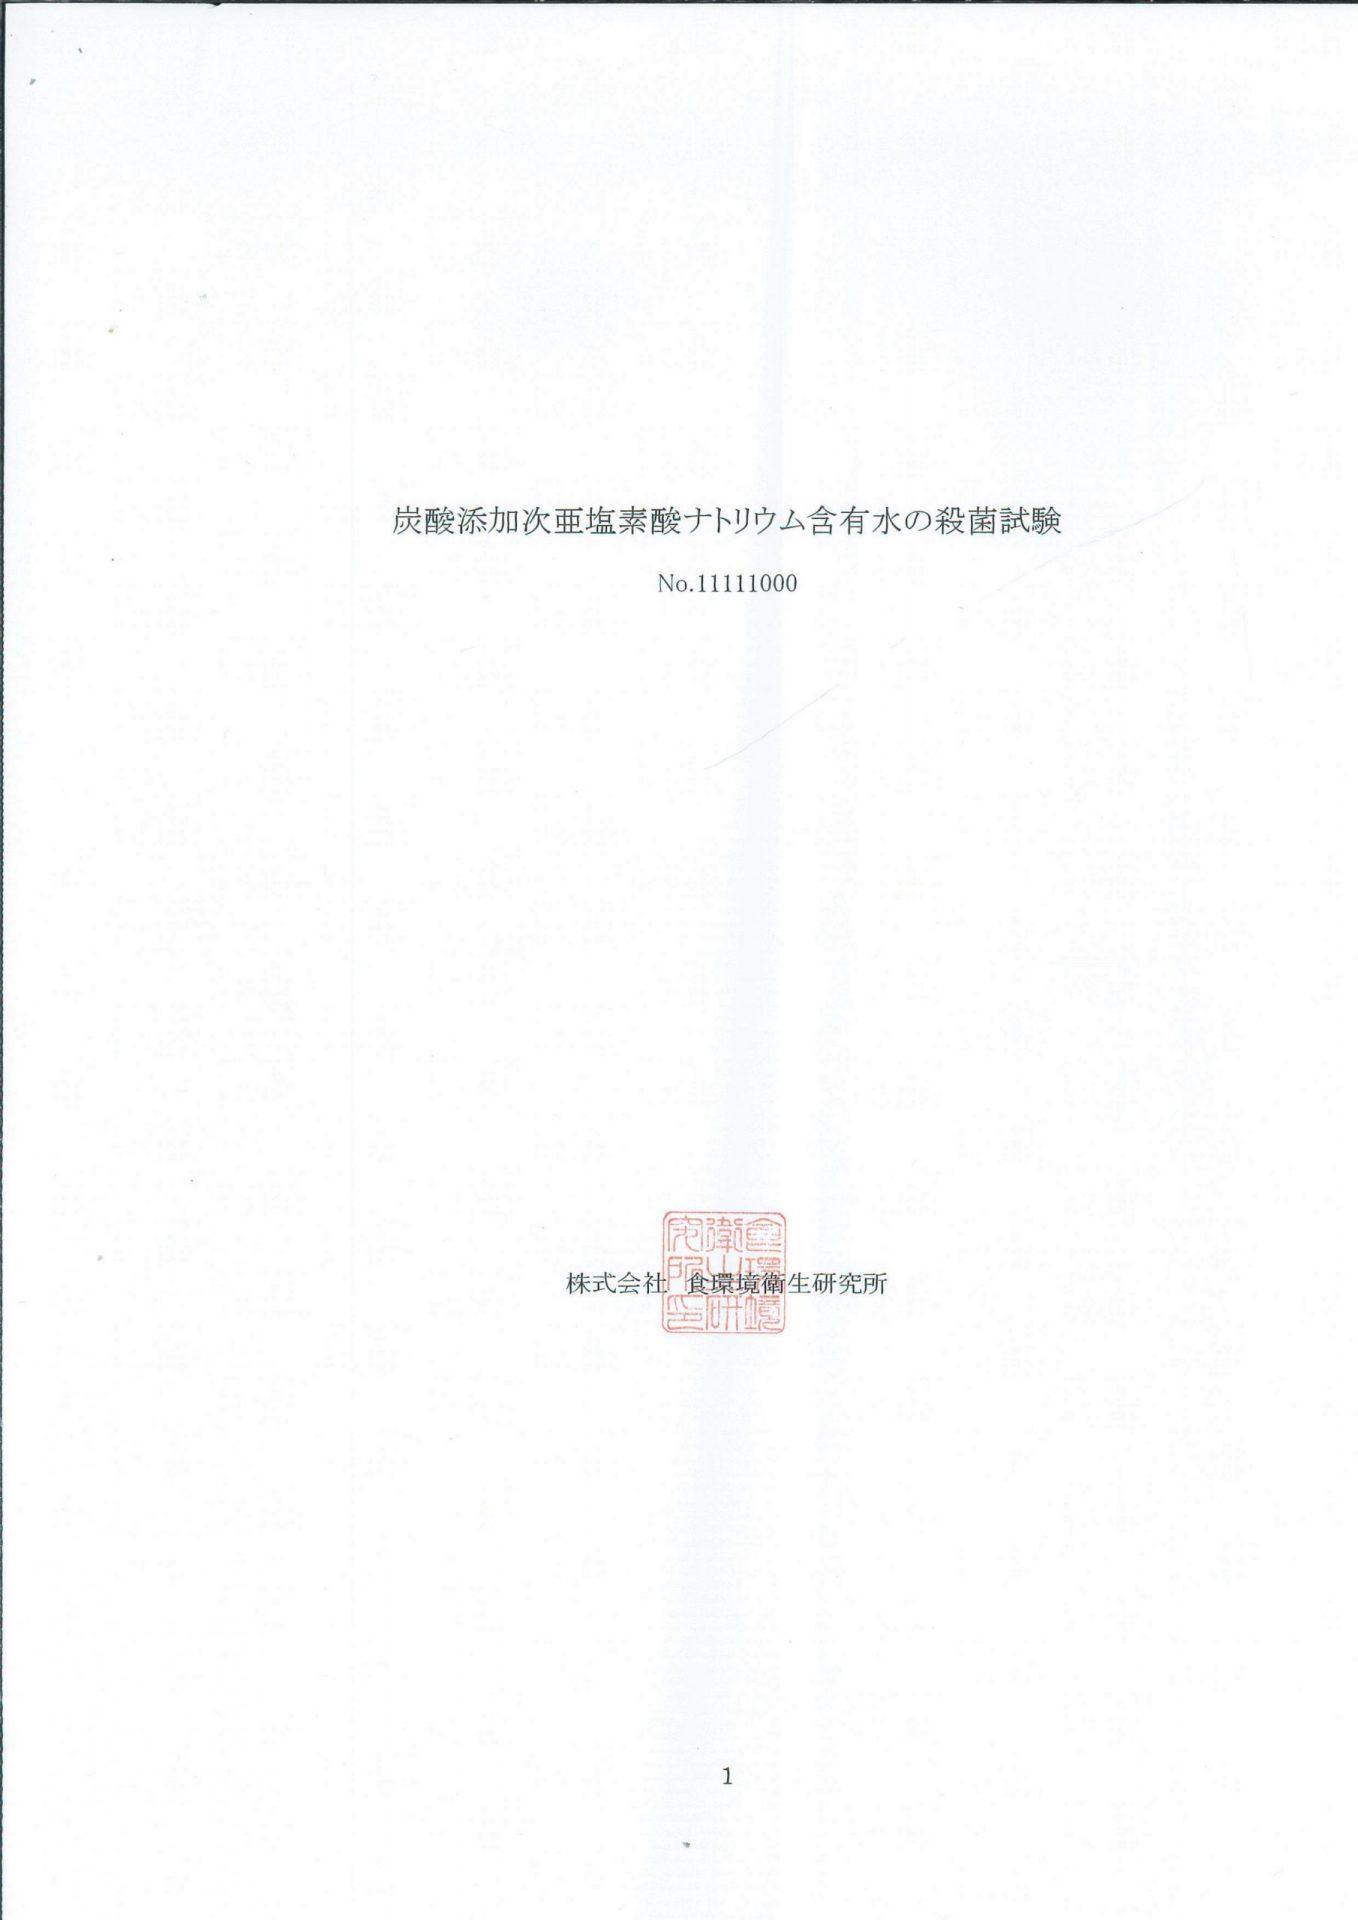 200731_1742_001